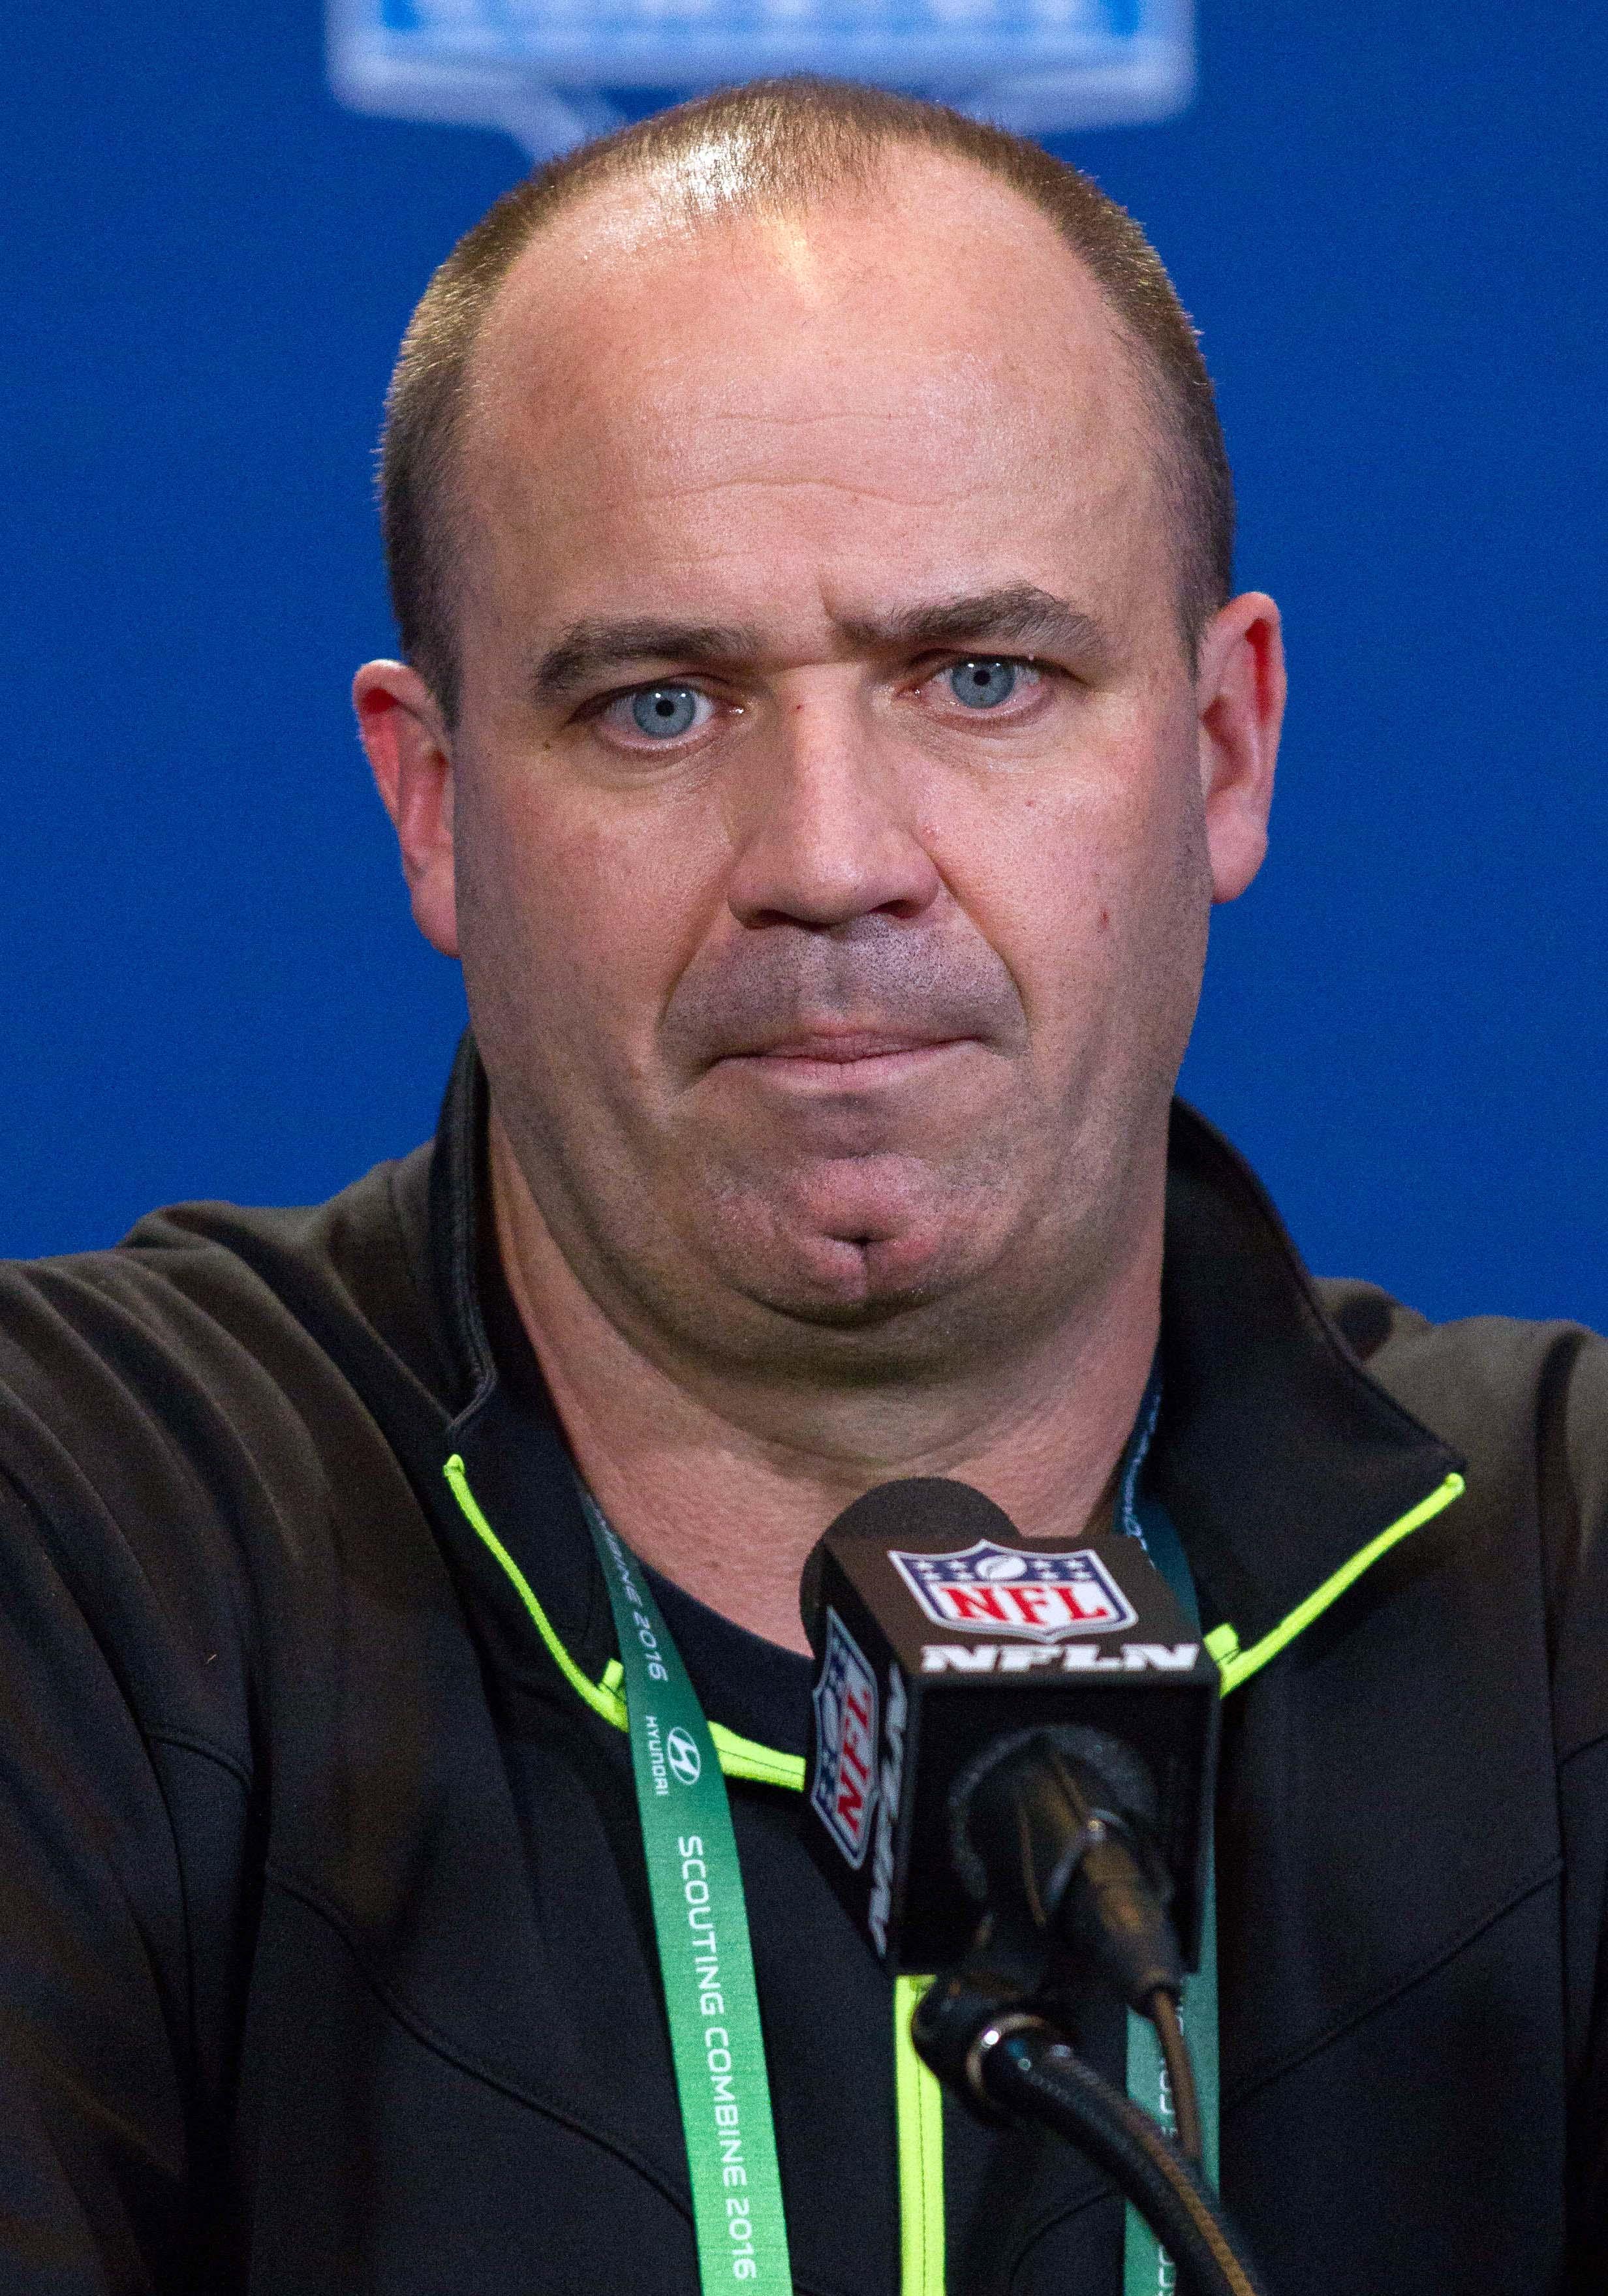 O'Brien's reaction to the Bag-Hangover mashup.